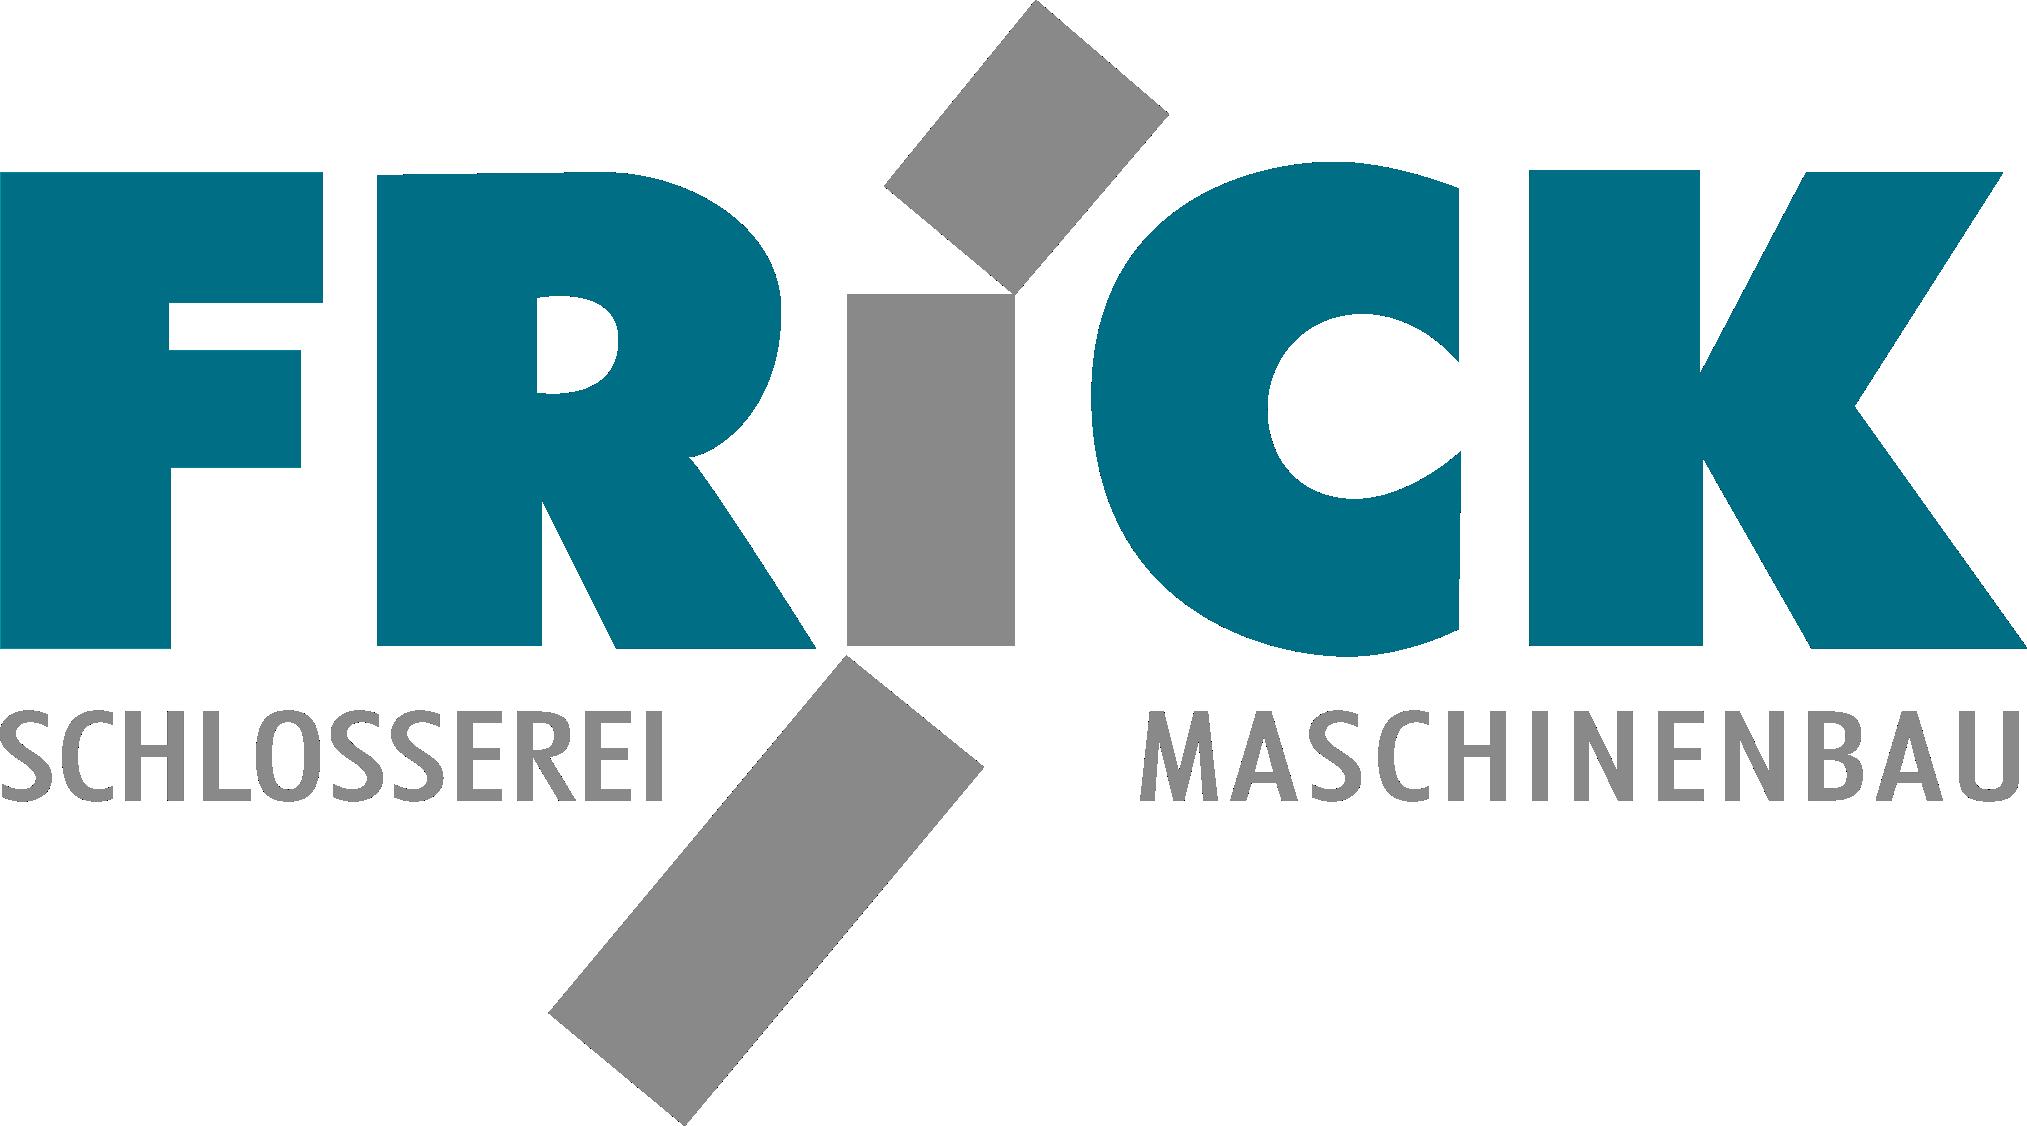 Frick Maschinenbau